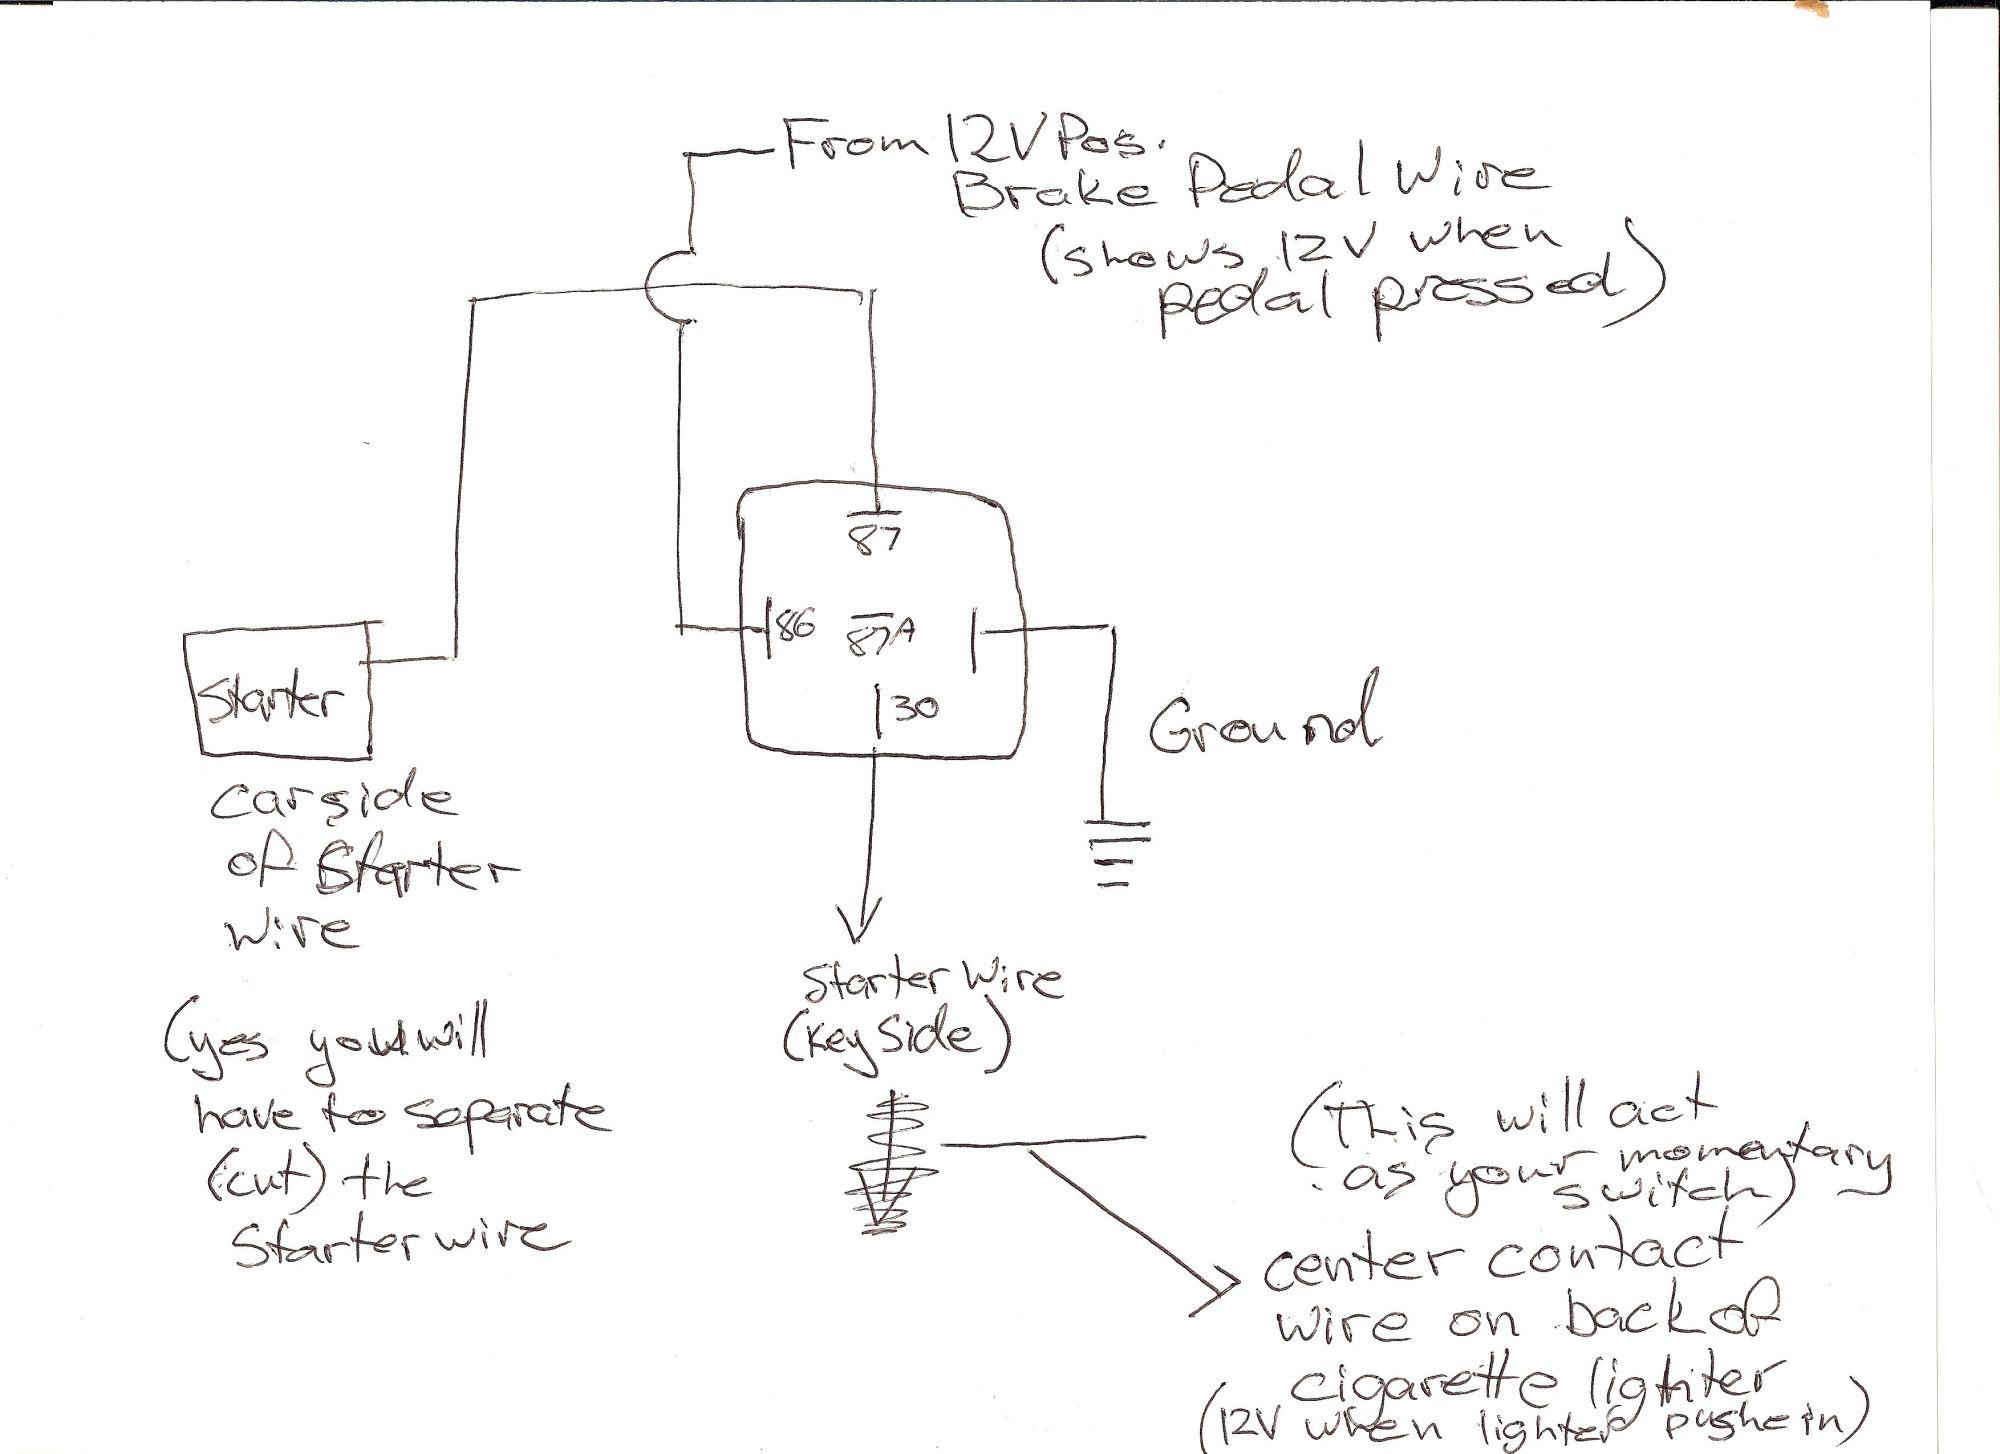 hight resolution of s2000 button start hondaswap s2000 button start hondaswap h8qtb ford relay wiring diagram at cita asia